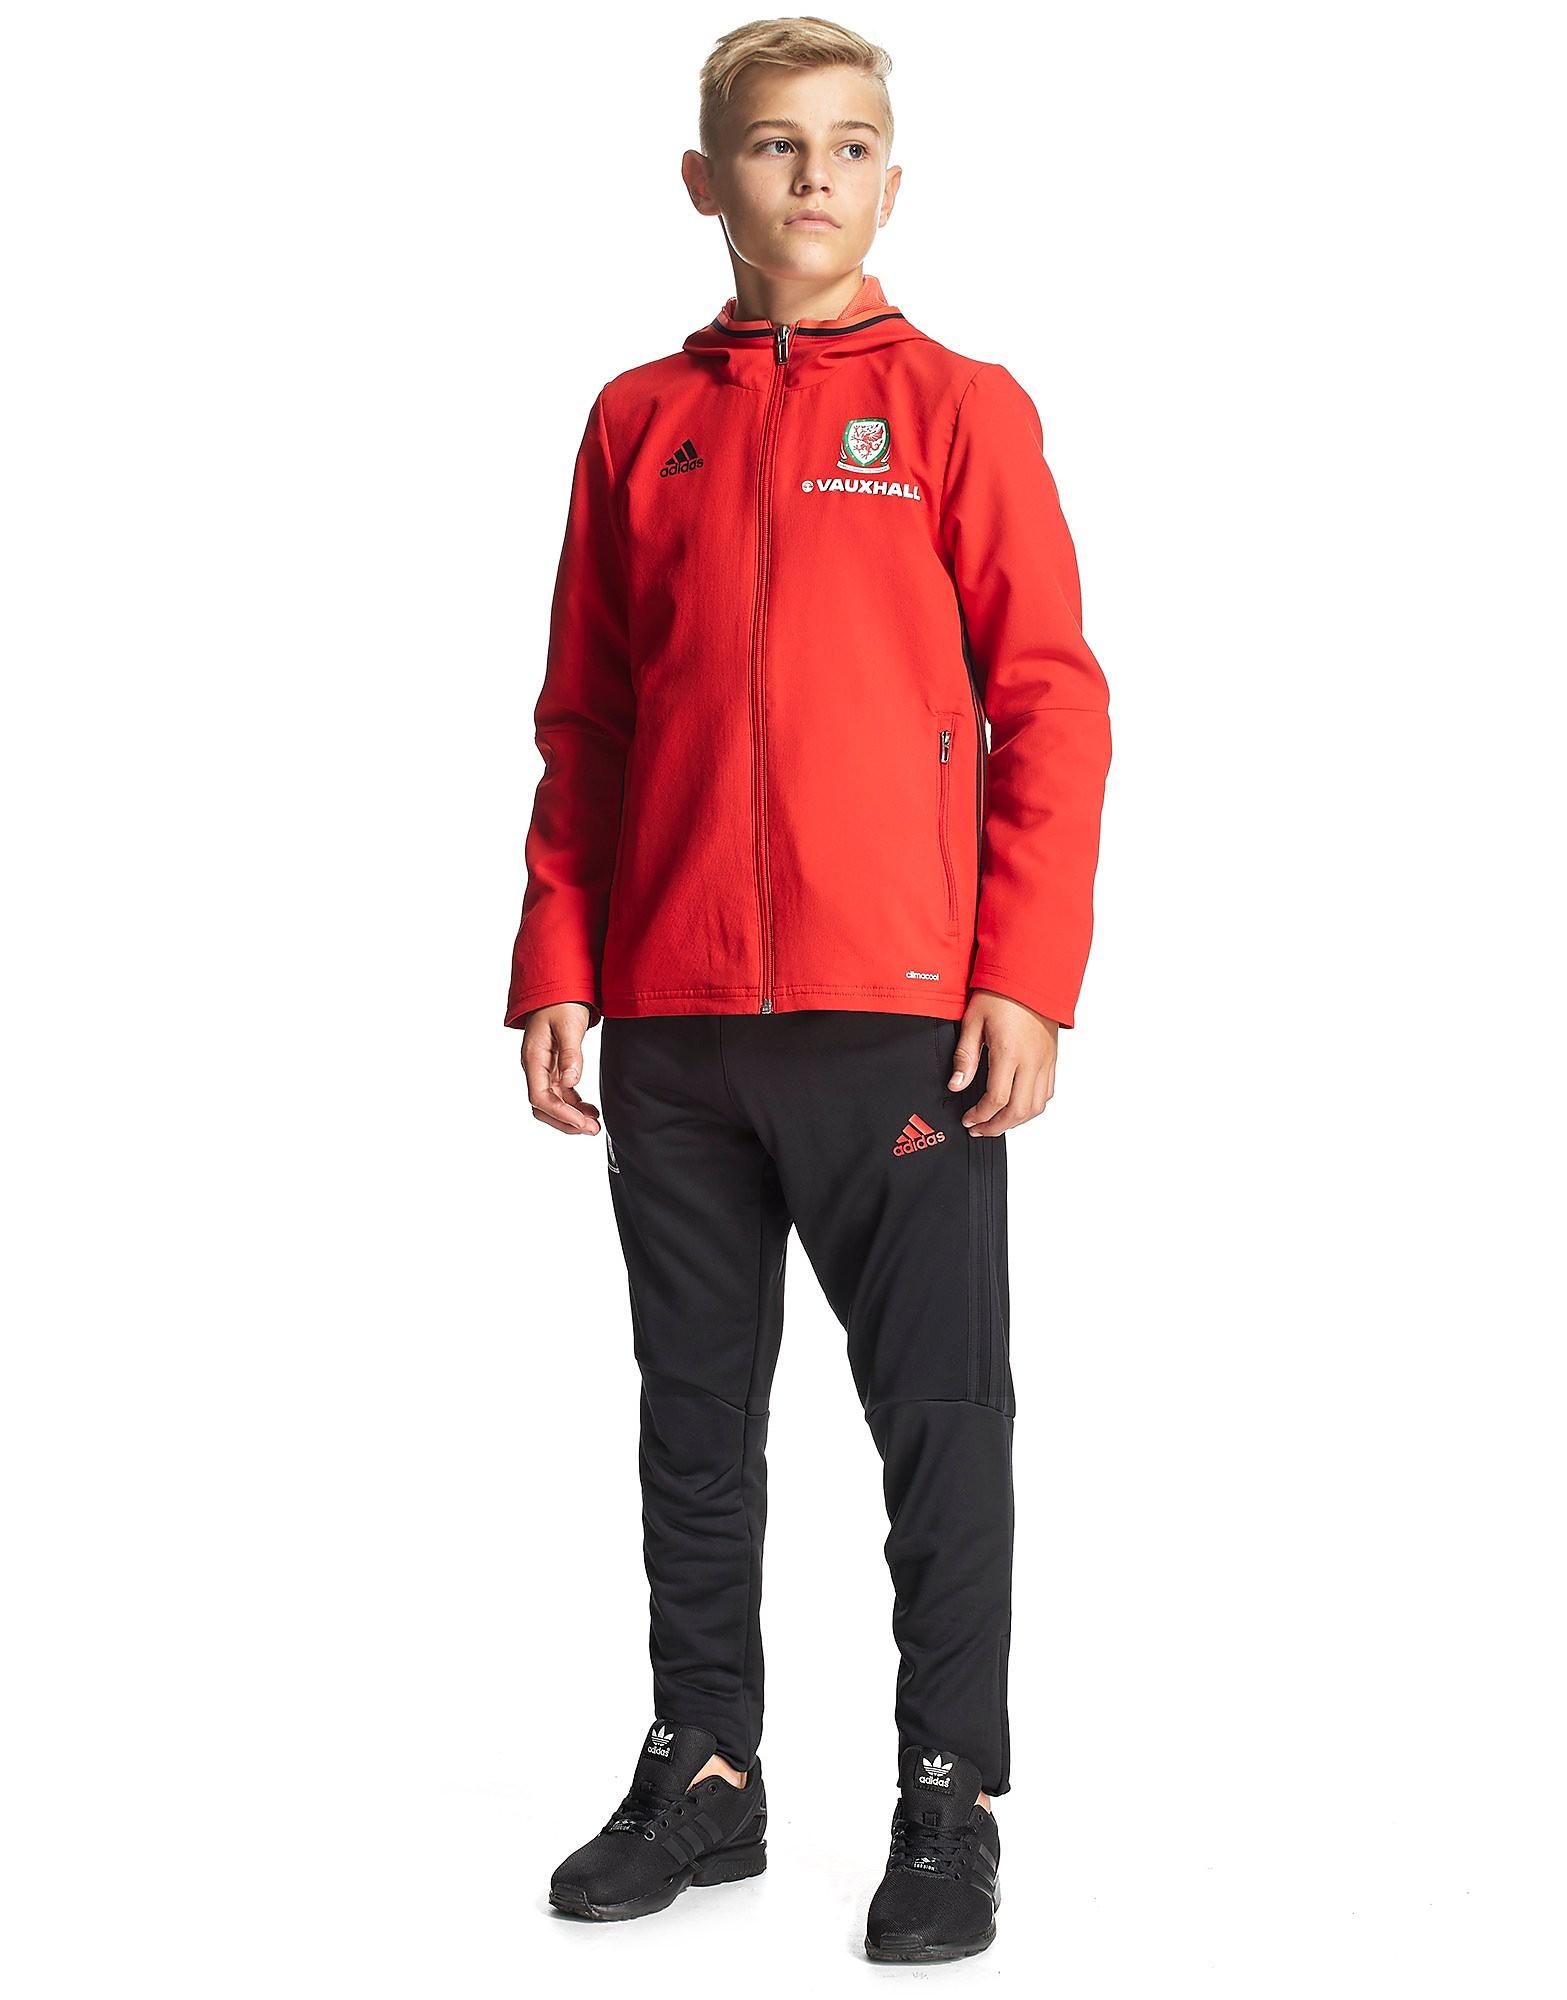 adidas Wales 2016/17 Presentation Suit Junior